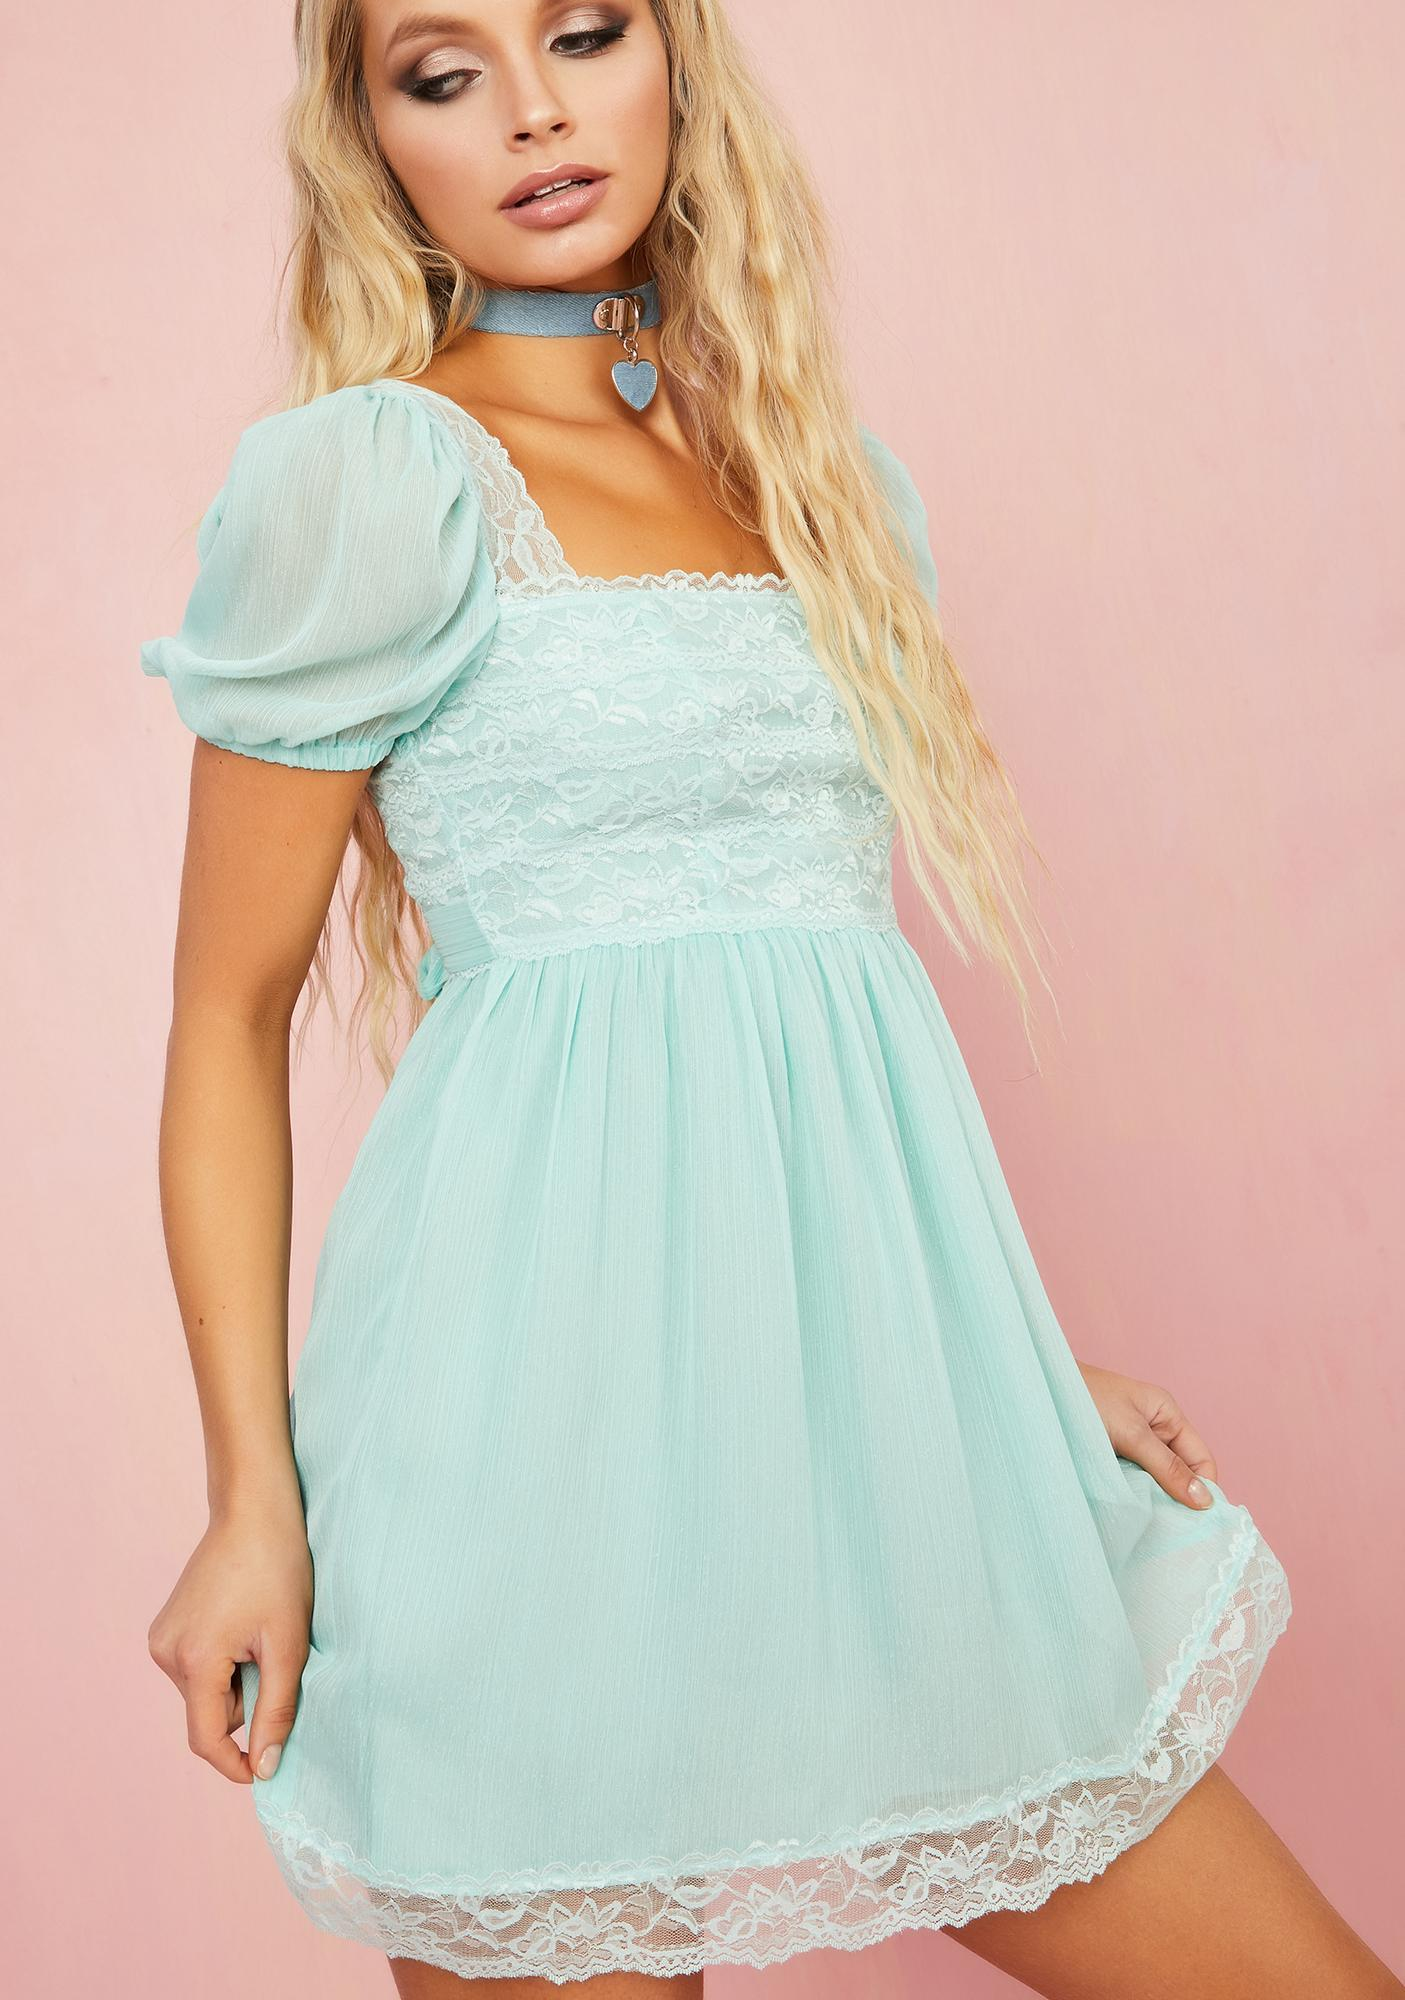 Sugar Thrillz Honeydew Pucker Babydoll Dress